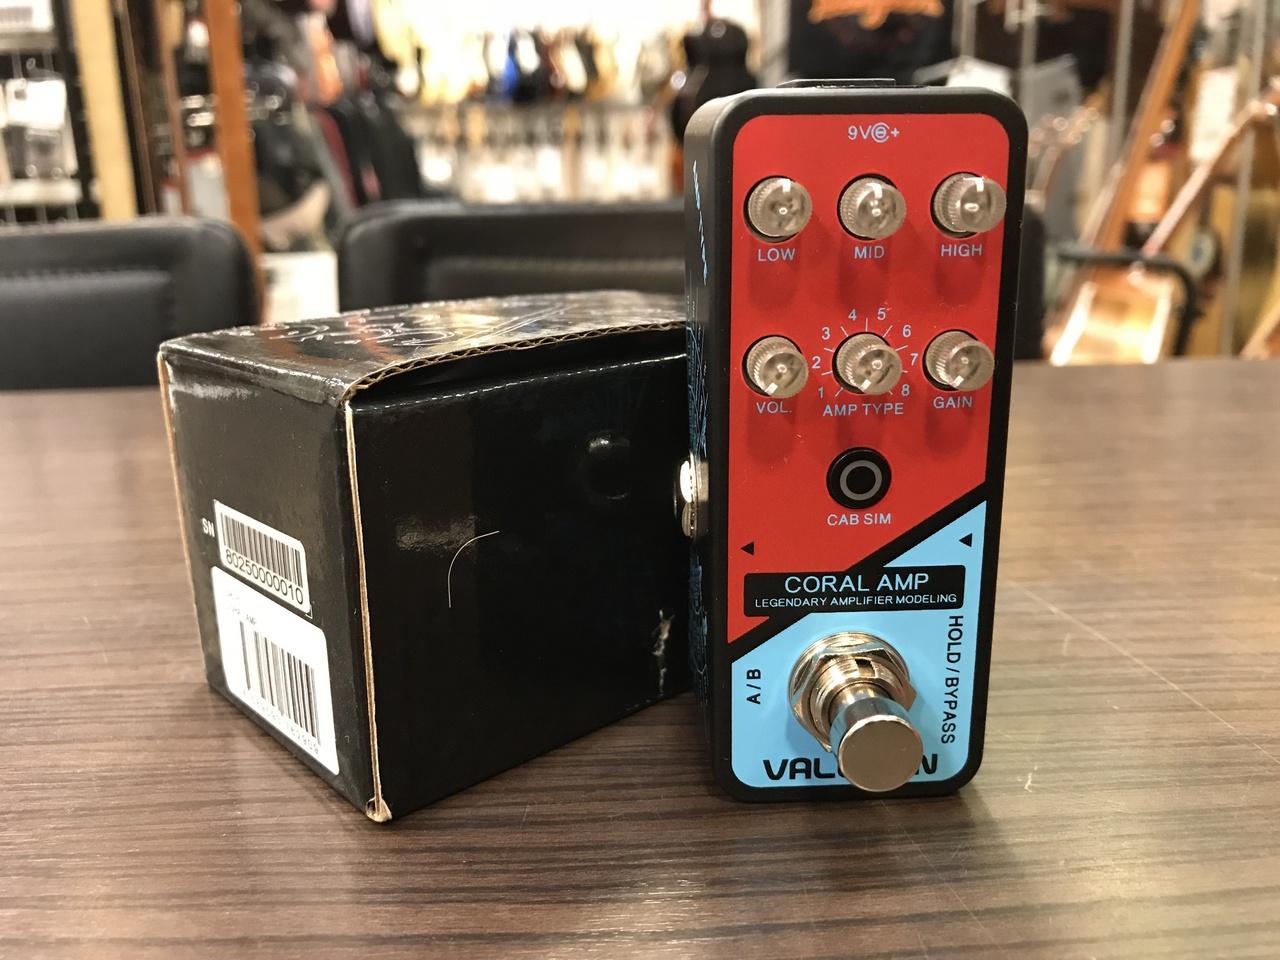 VALETON CRL-5 Coral Amp Legendary Amplifier Modeling